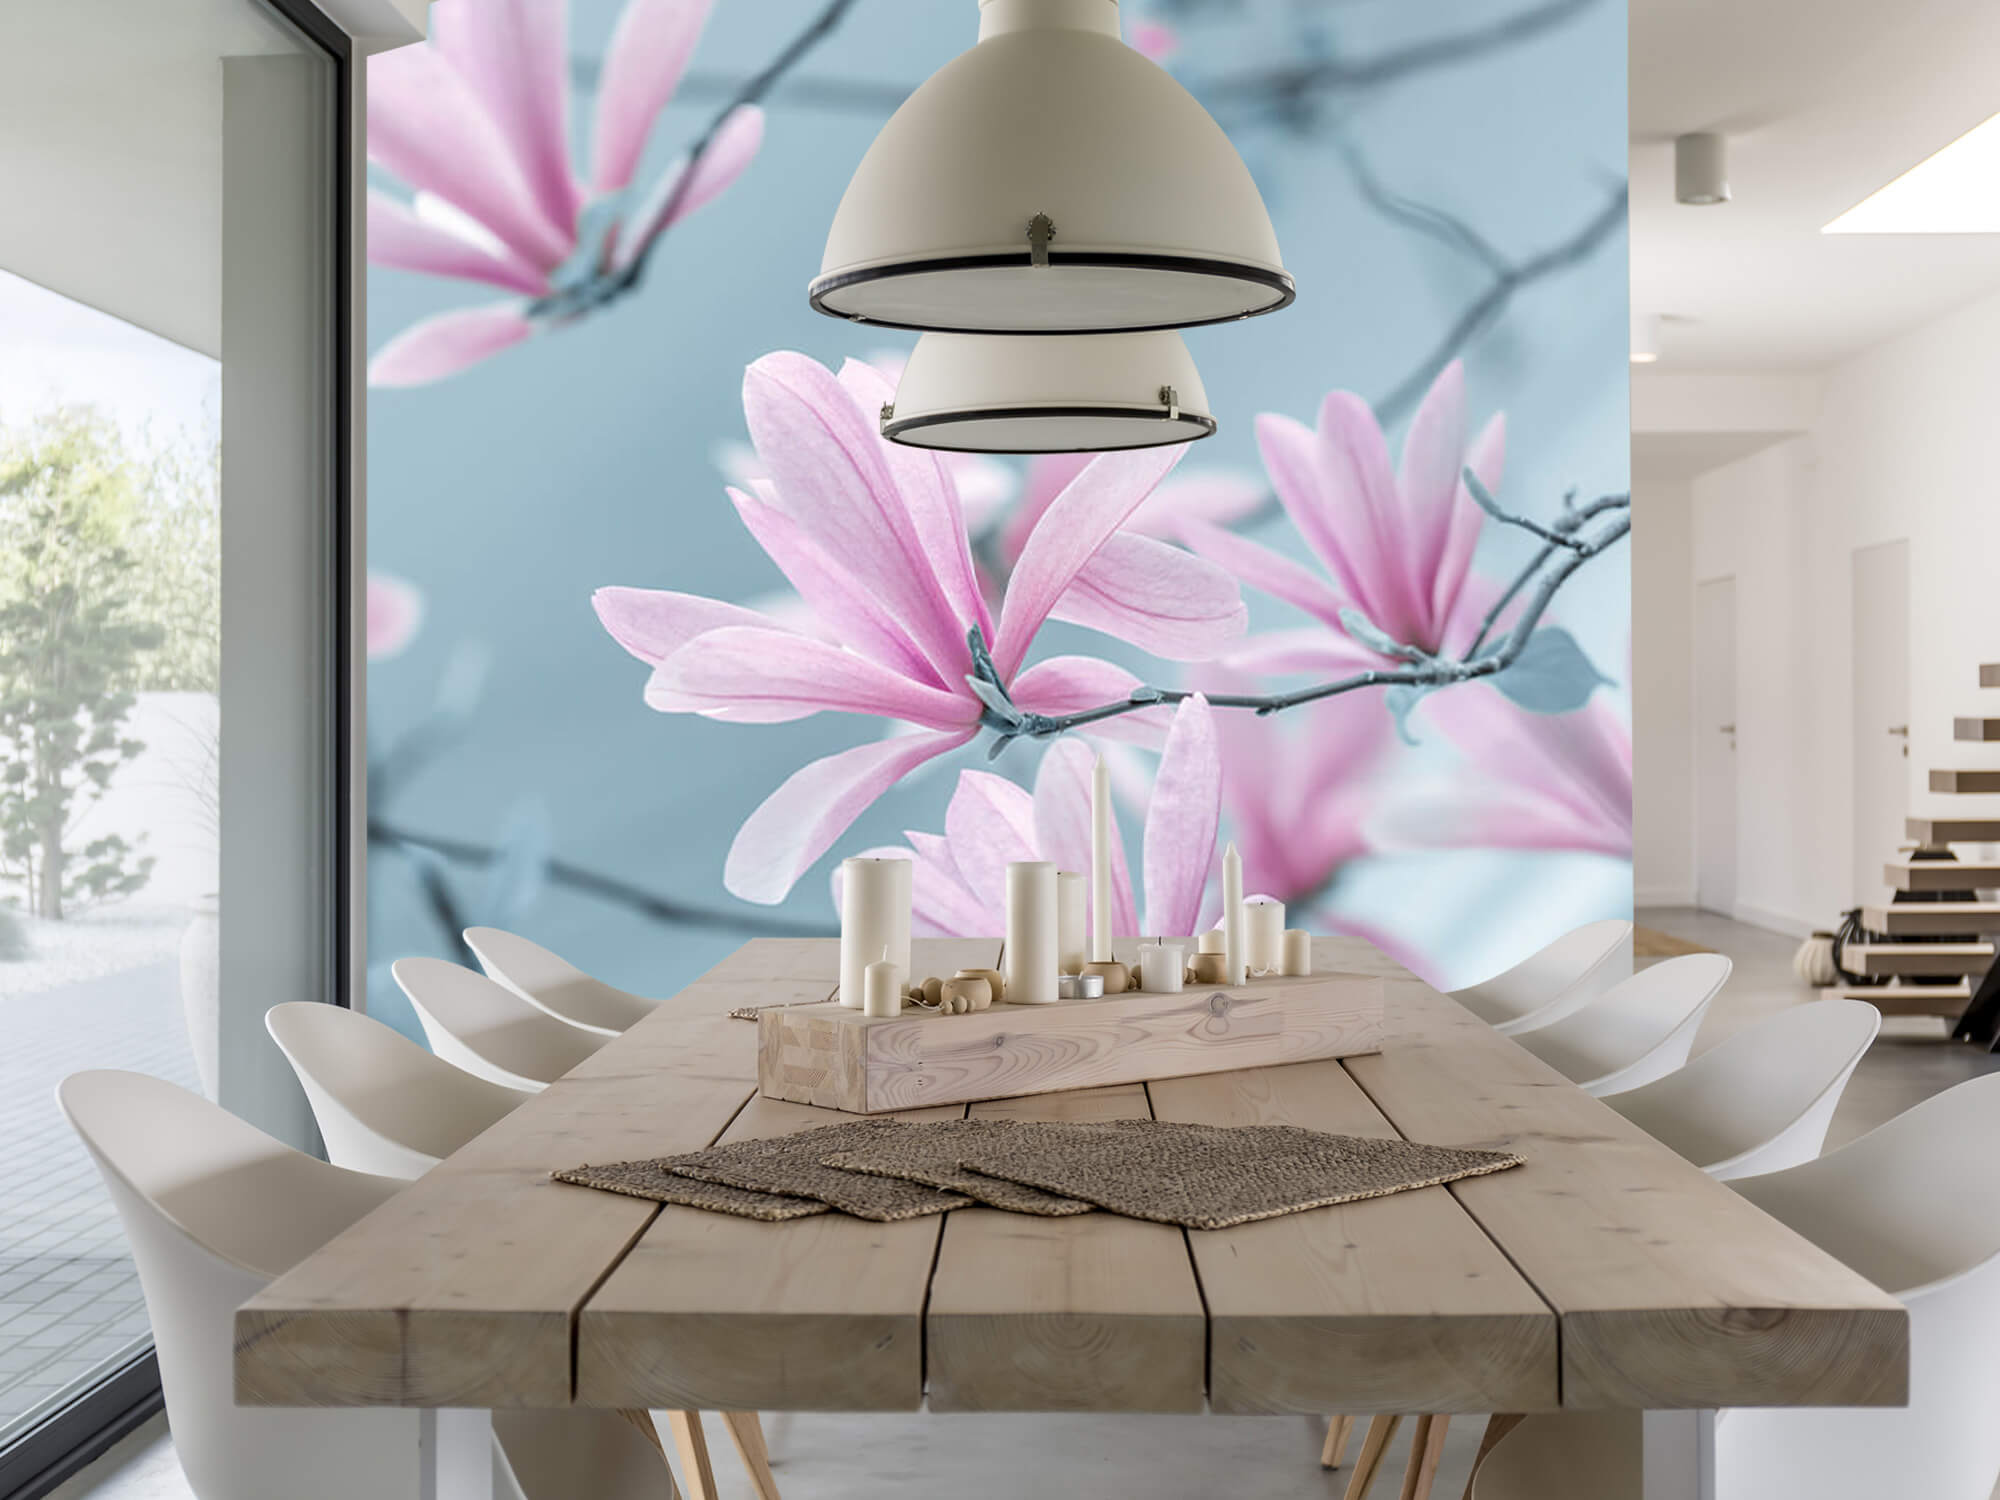 Magnolia bloemen 1